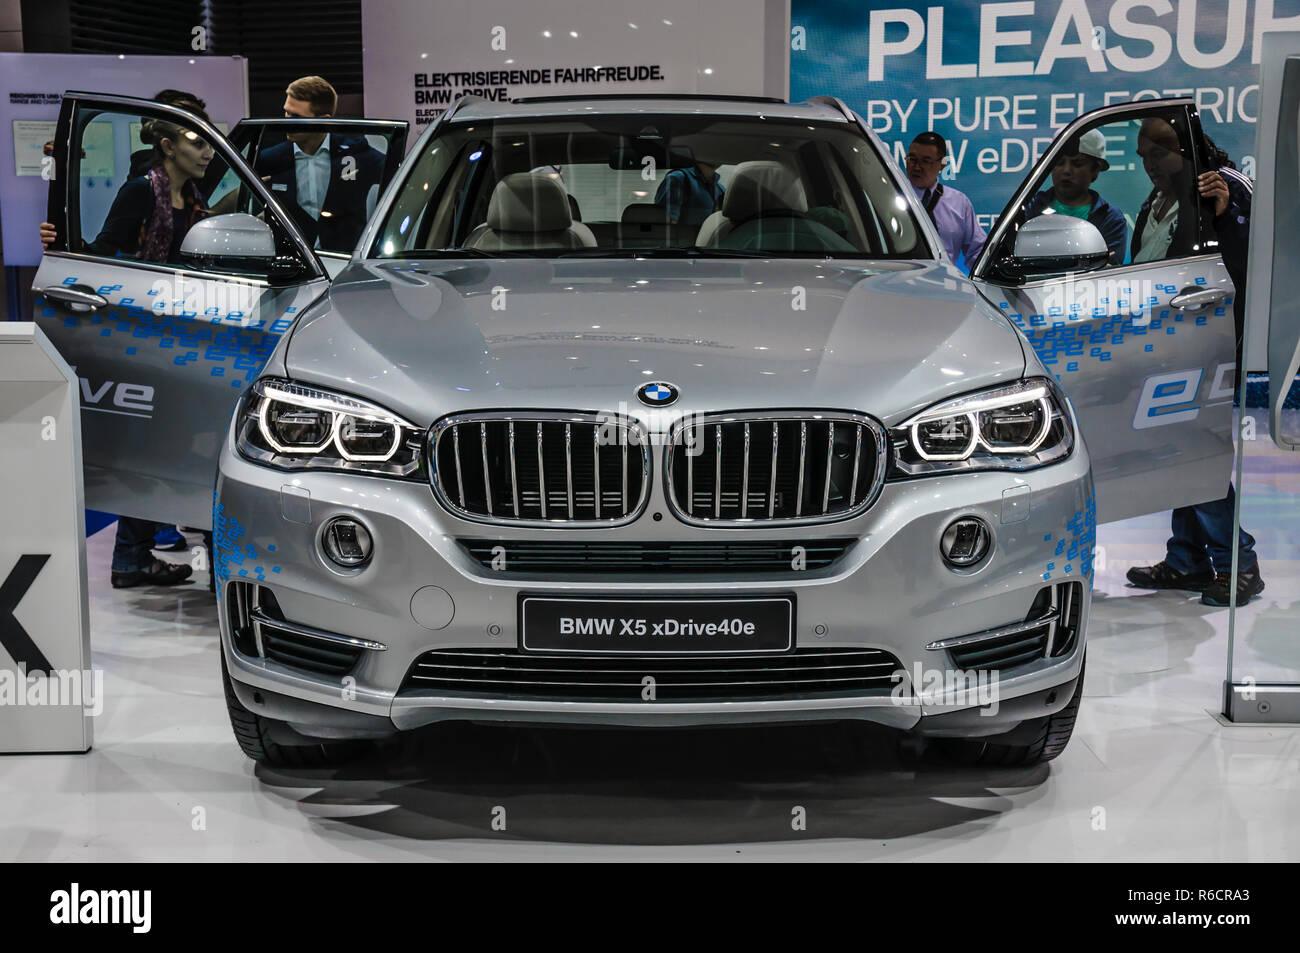 FRANKFURT - SEPT 2015: BMW X5 xDrive40e presented at IAA International Motor Show on September 20, 2015 in Frankfurt, Germany - Stock Image